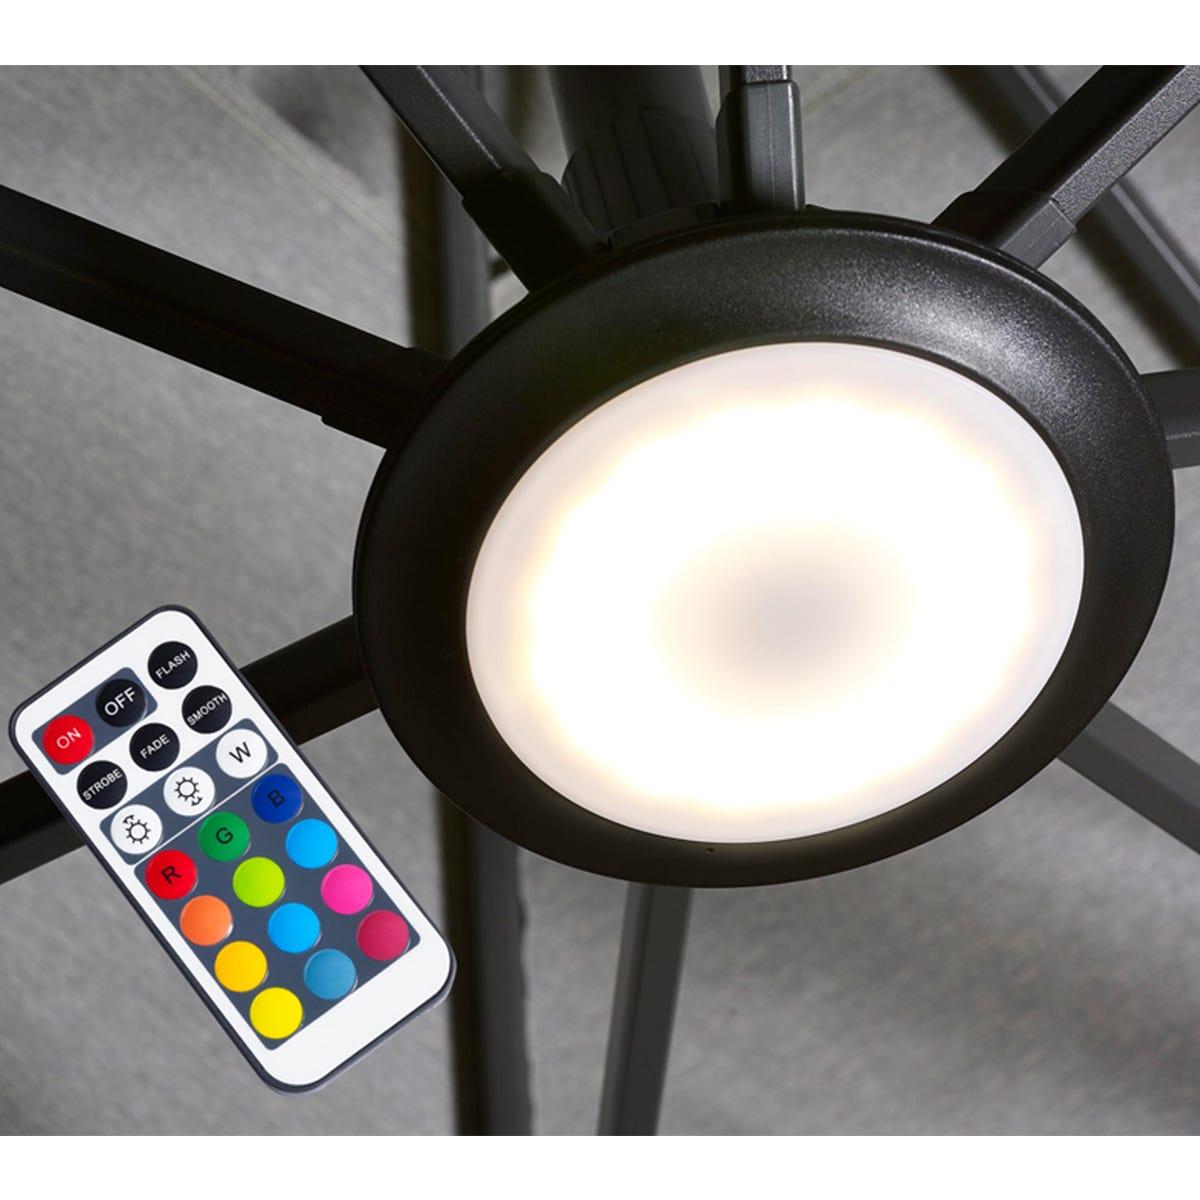 Pacific Lifestyle Multi Coloured LED Parasol Light